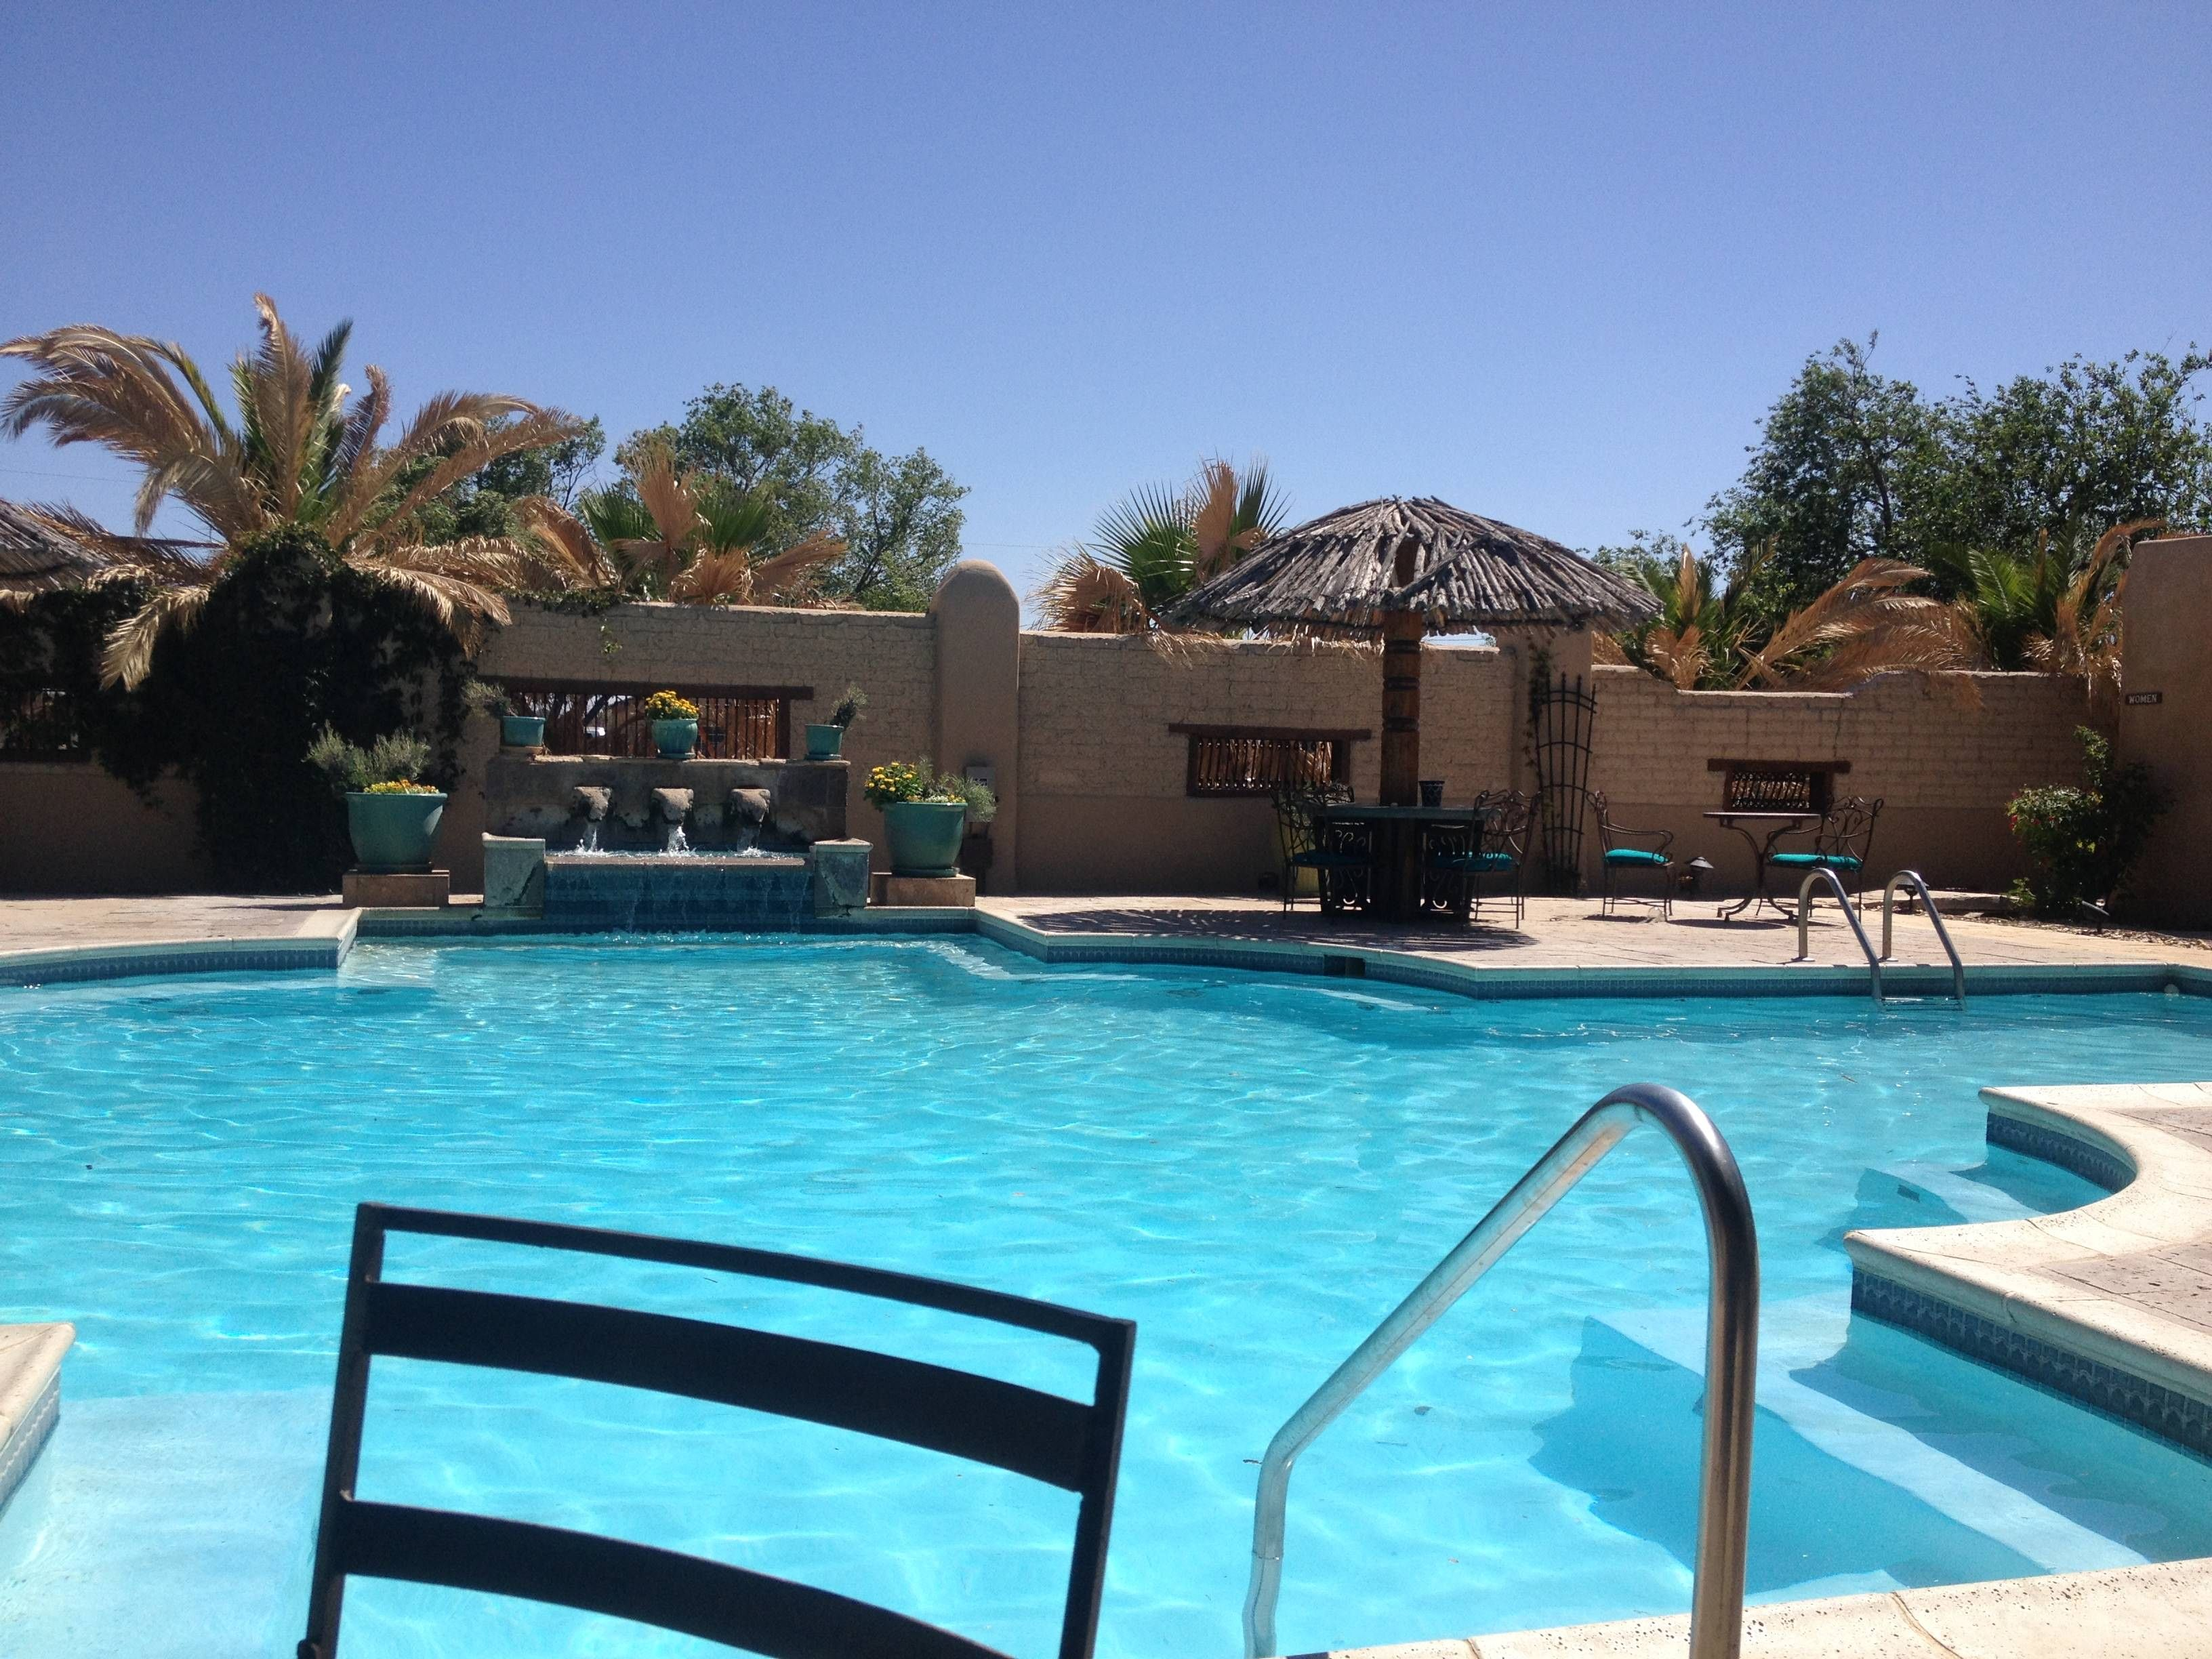 Gage Hotel Pool Marathon Texas Hotel Pool Big Bend National Parks